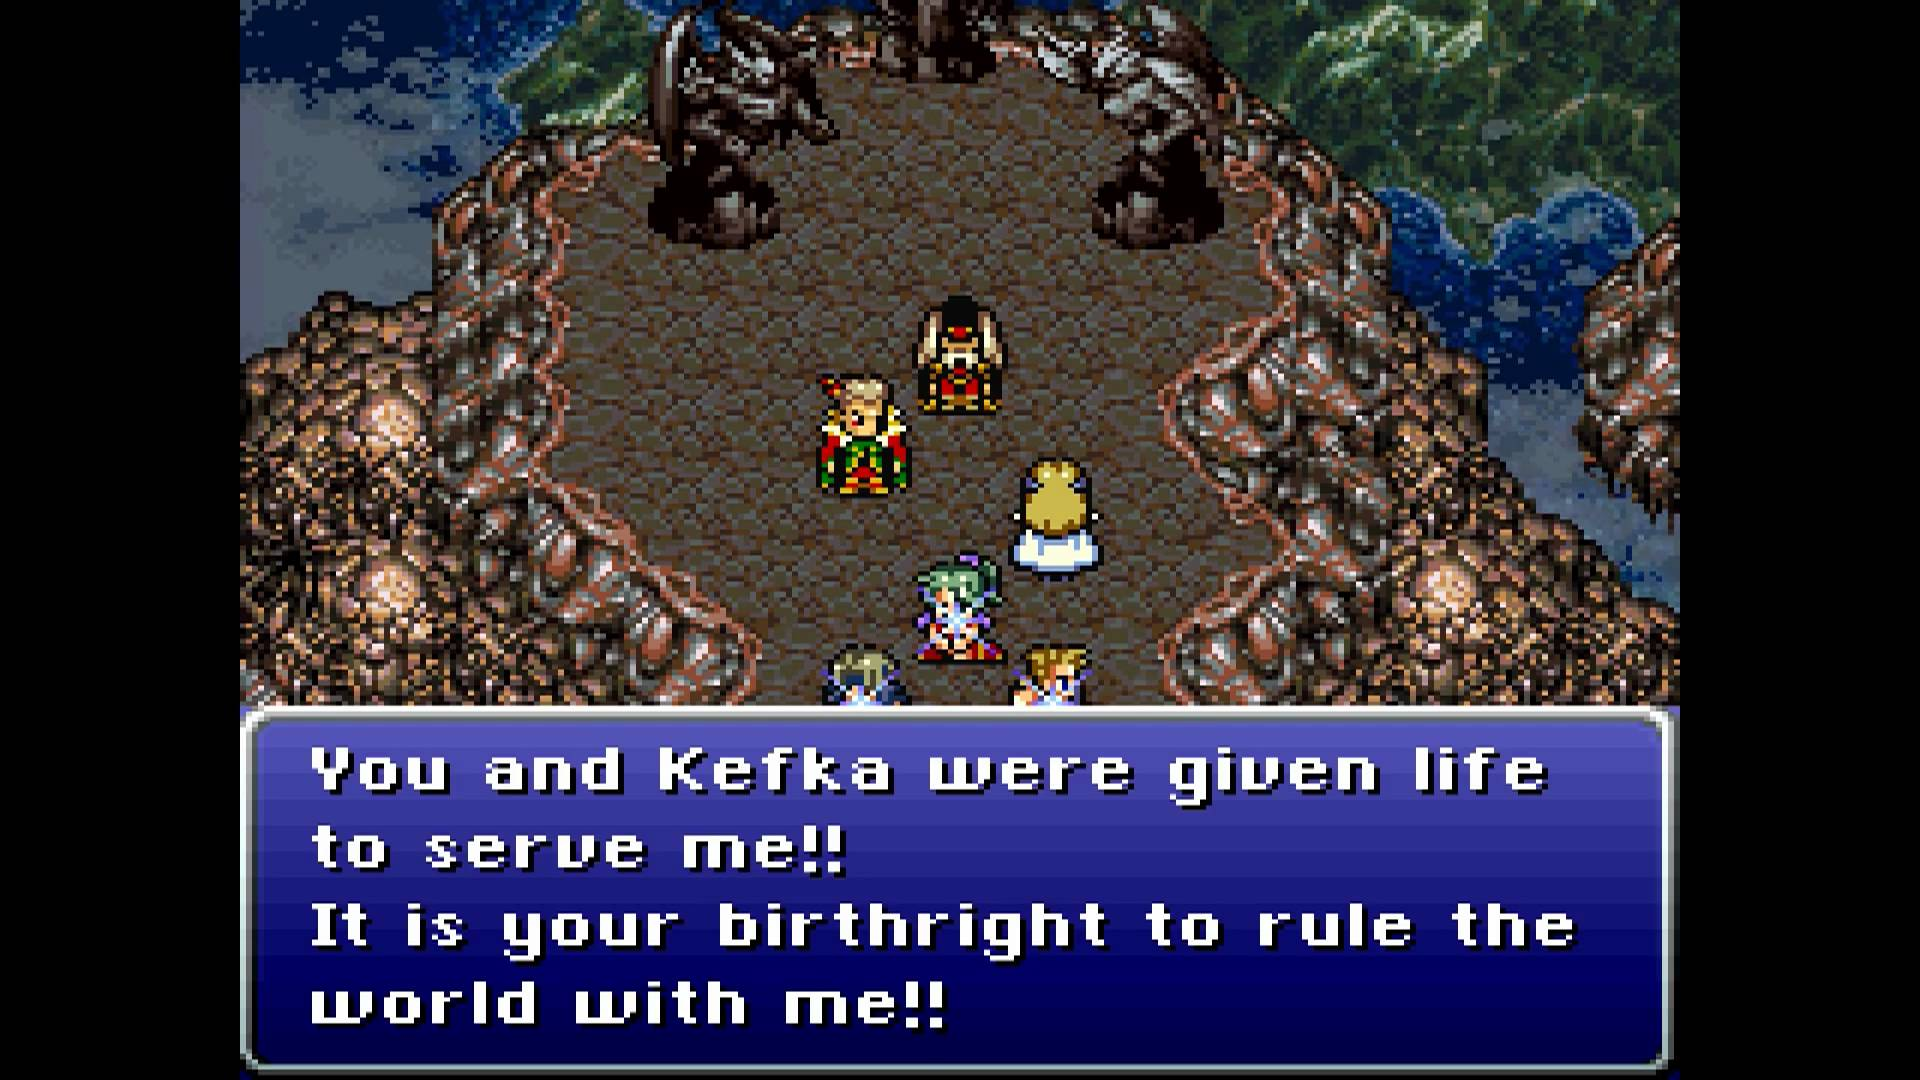 Hironobu Sakaguchi, creator of the Final Fantasy series